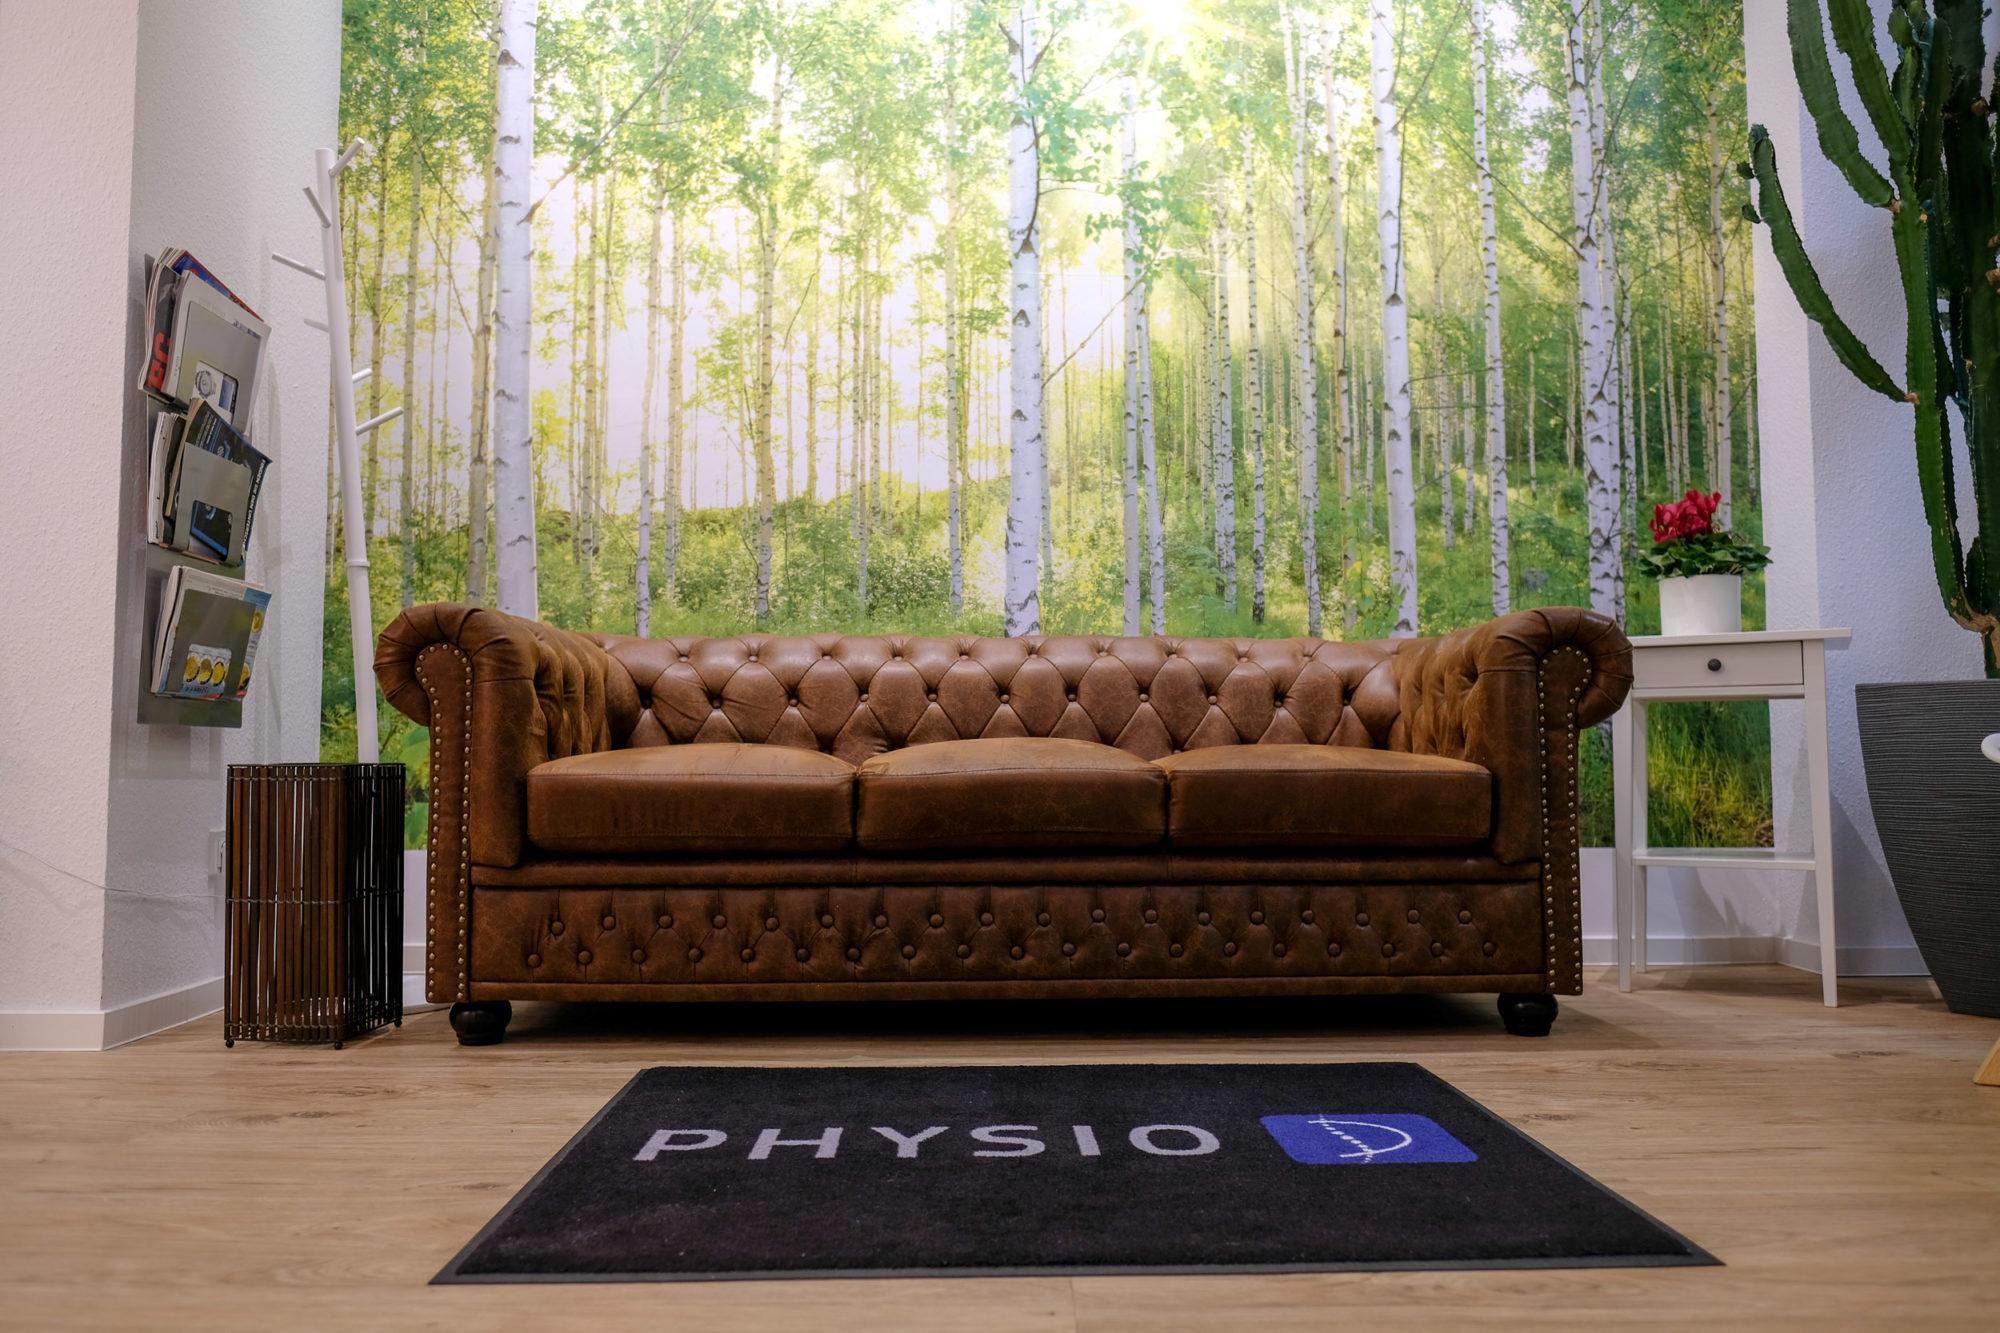 Physio-D - Physiotherapie in Bergisch Gladbach